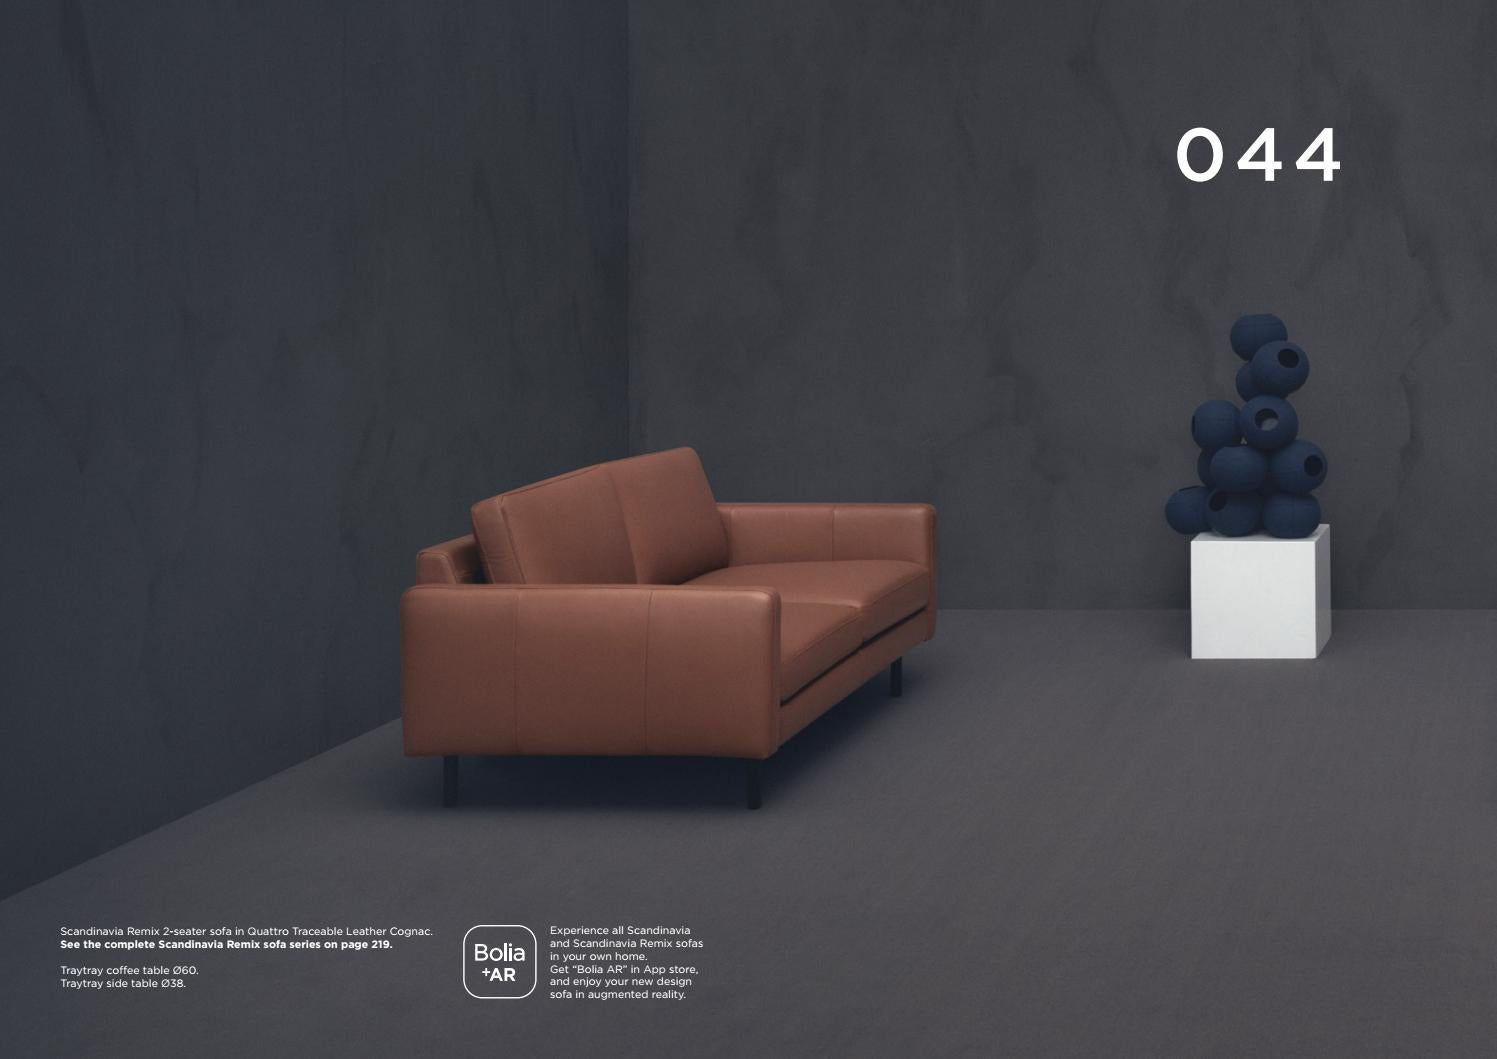 Lookbook 2018 by bolia.com issuu